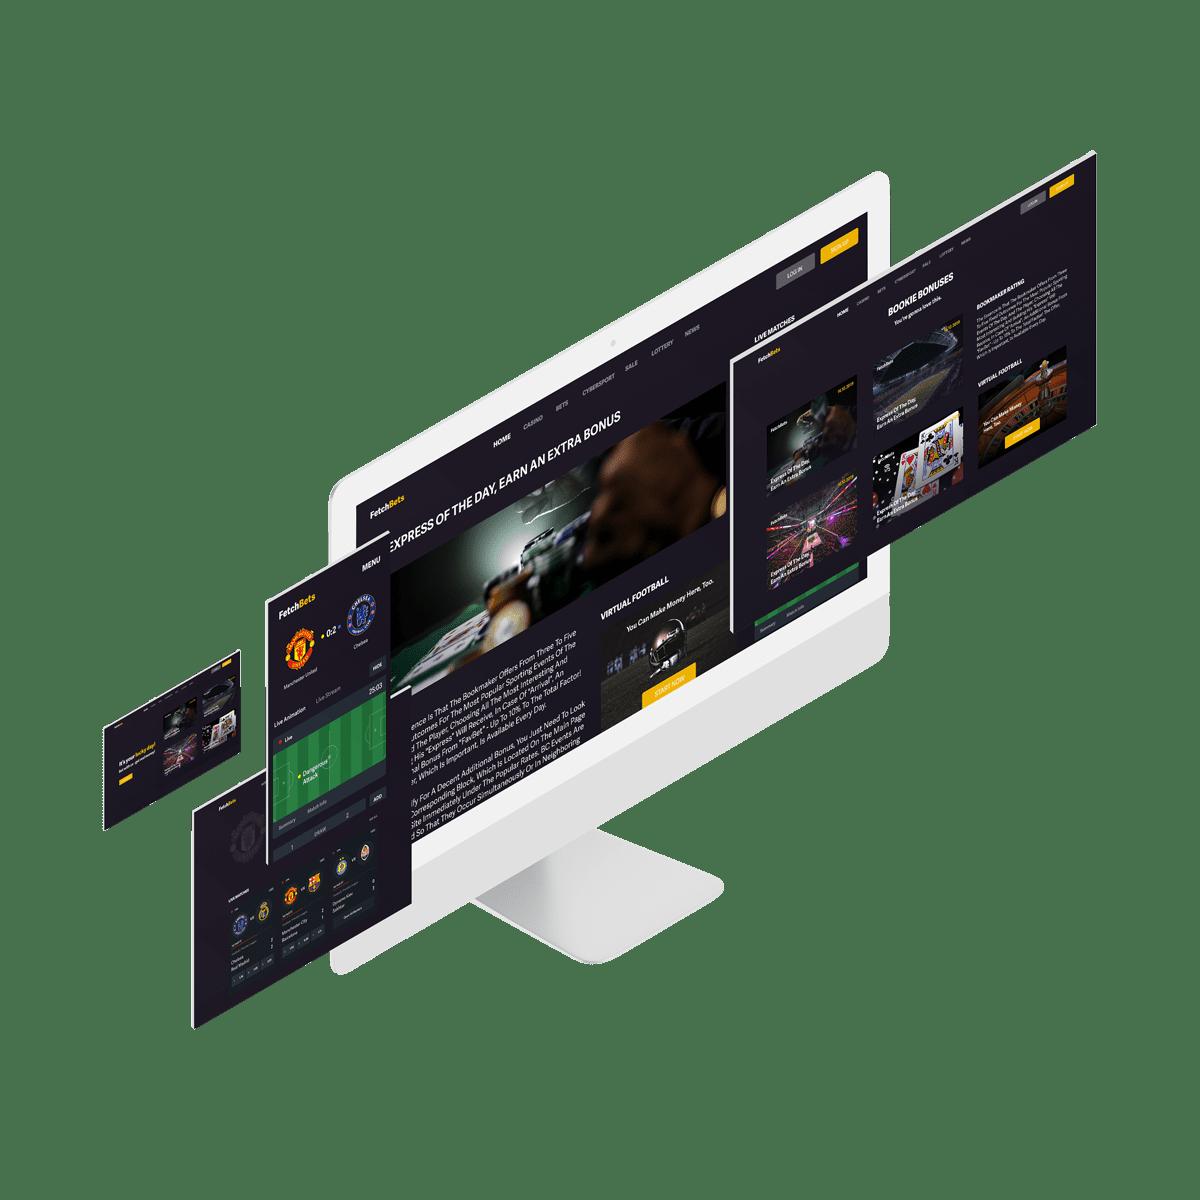 Interface of a gambling data analyzer